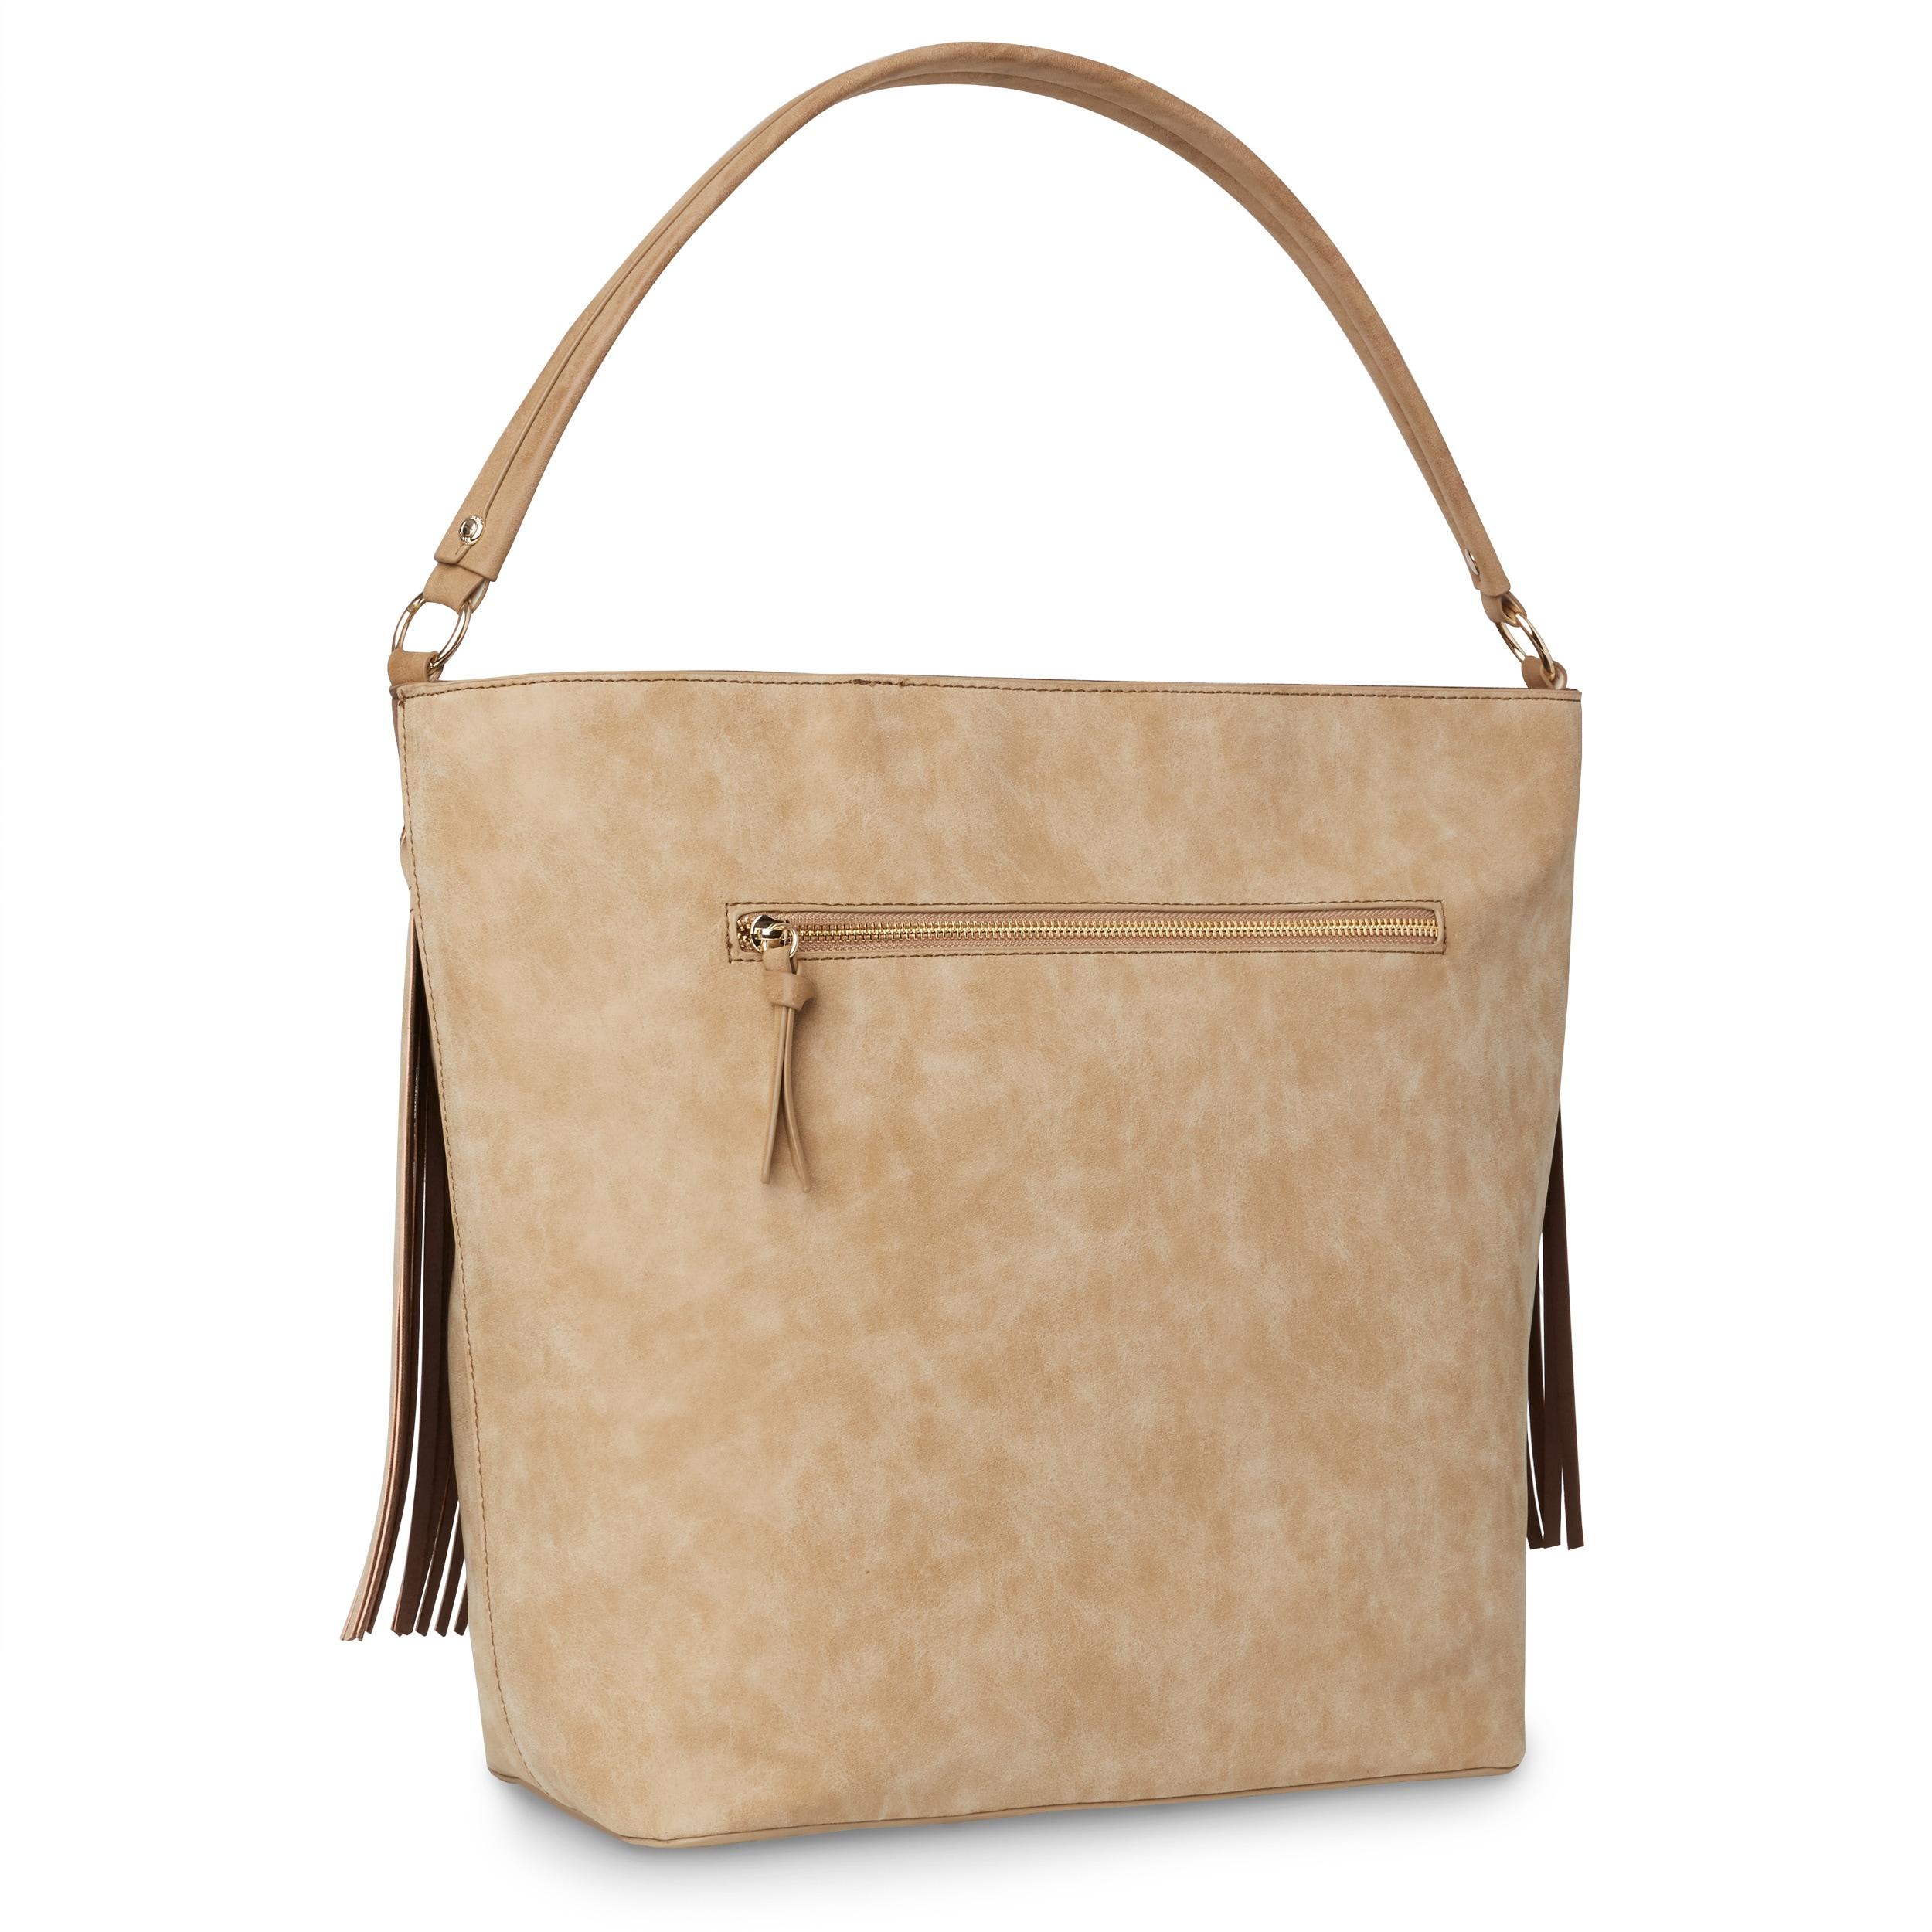 f44bc053e8 Shop Steven by Steve Madden Gena Fringed Hobo Handbag - Free Shipping Today  - Overstock - 15232331